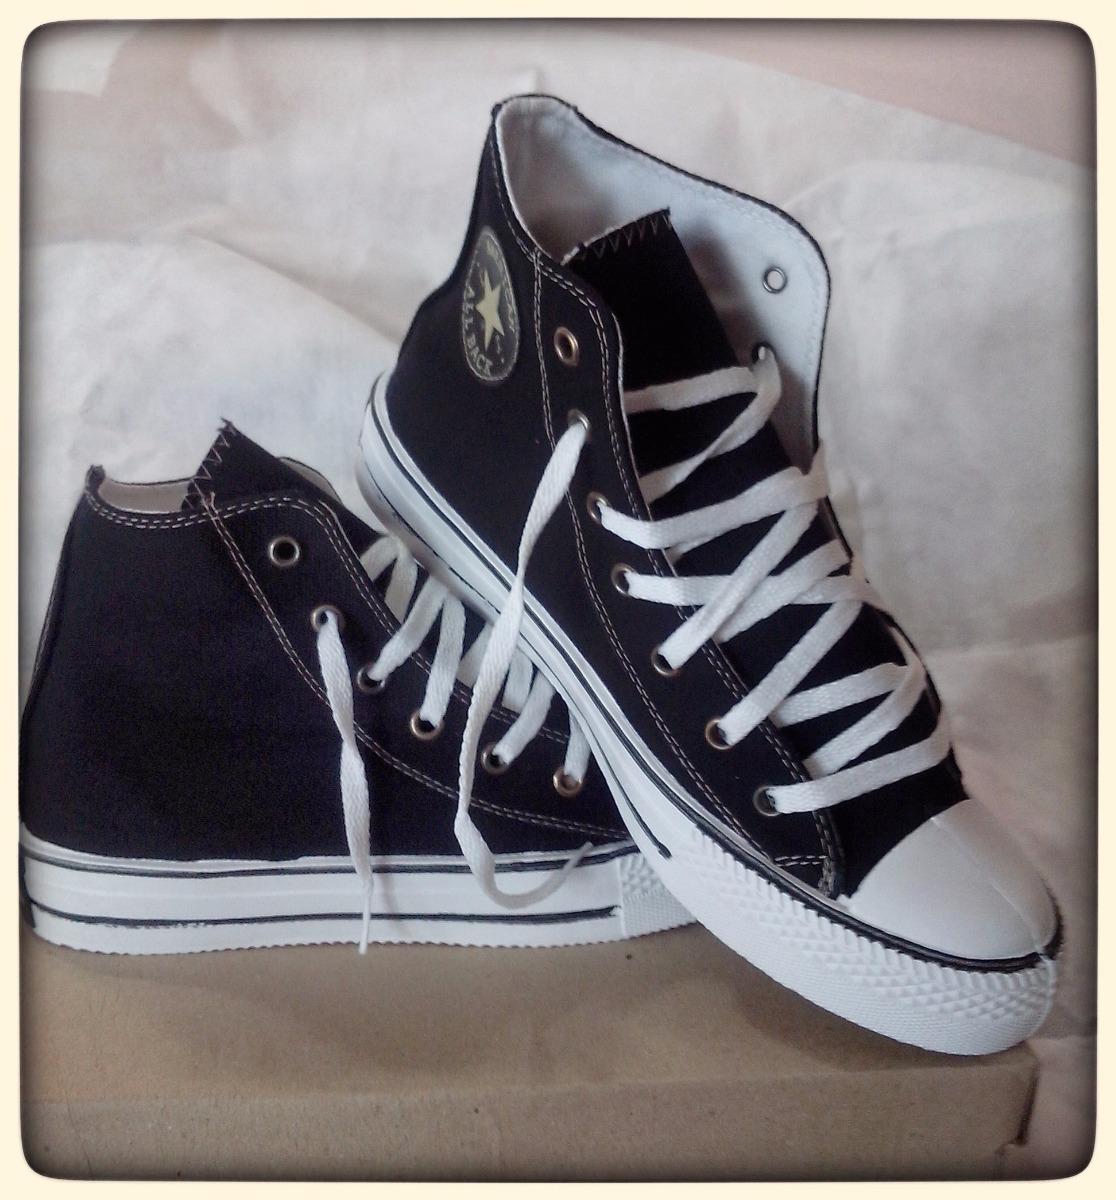 ... 350293e800 zapatillas botitas negras lisas de lona. Cargando zoom. 1c5838f3f1168